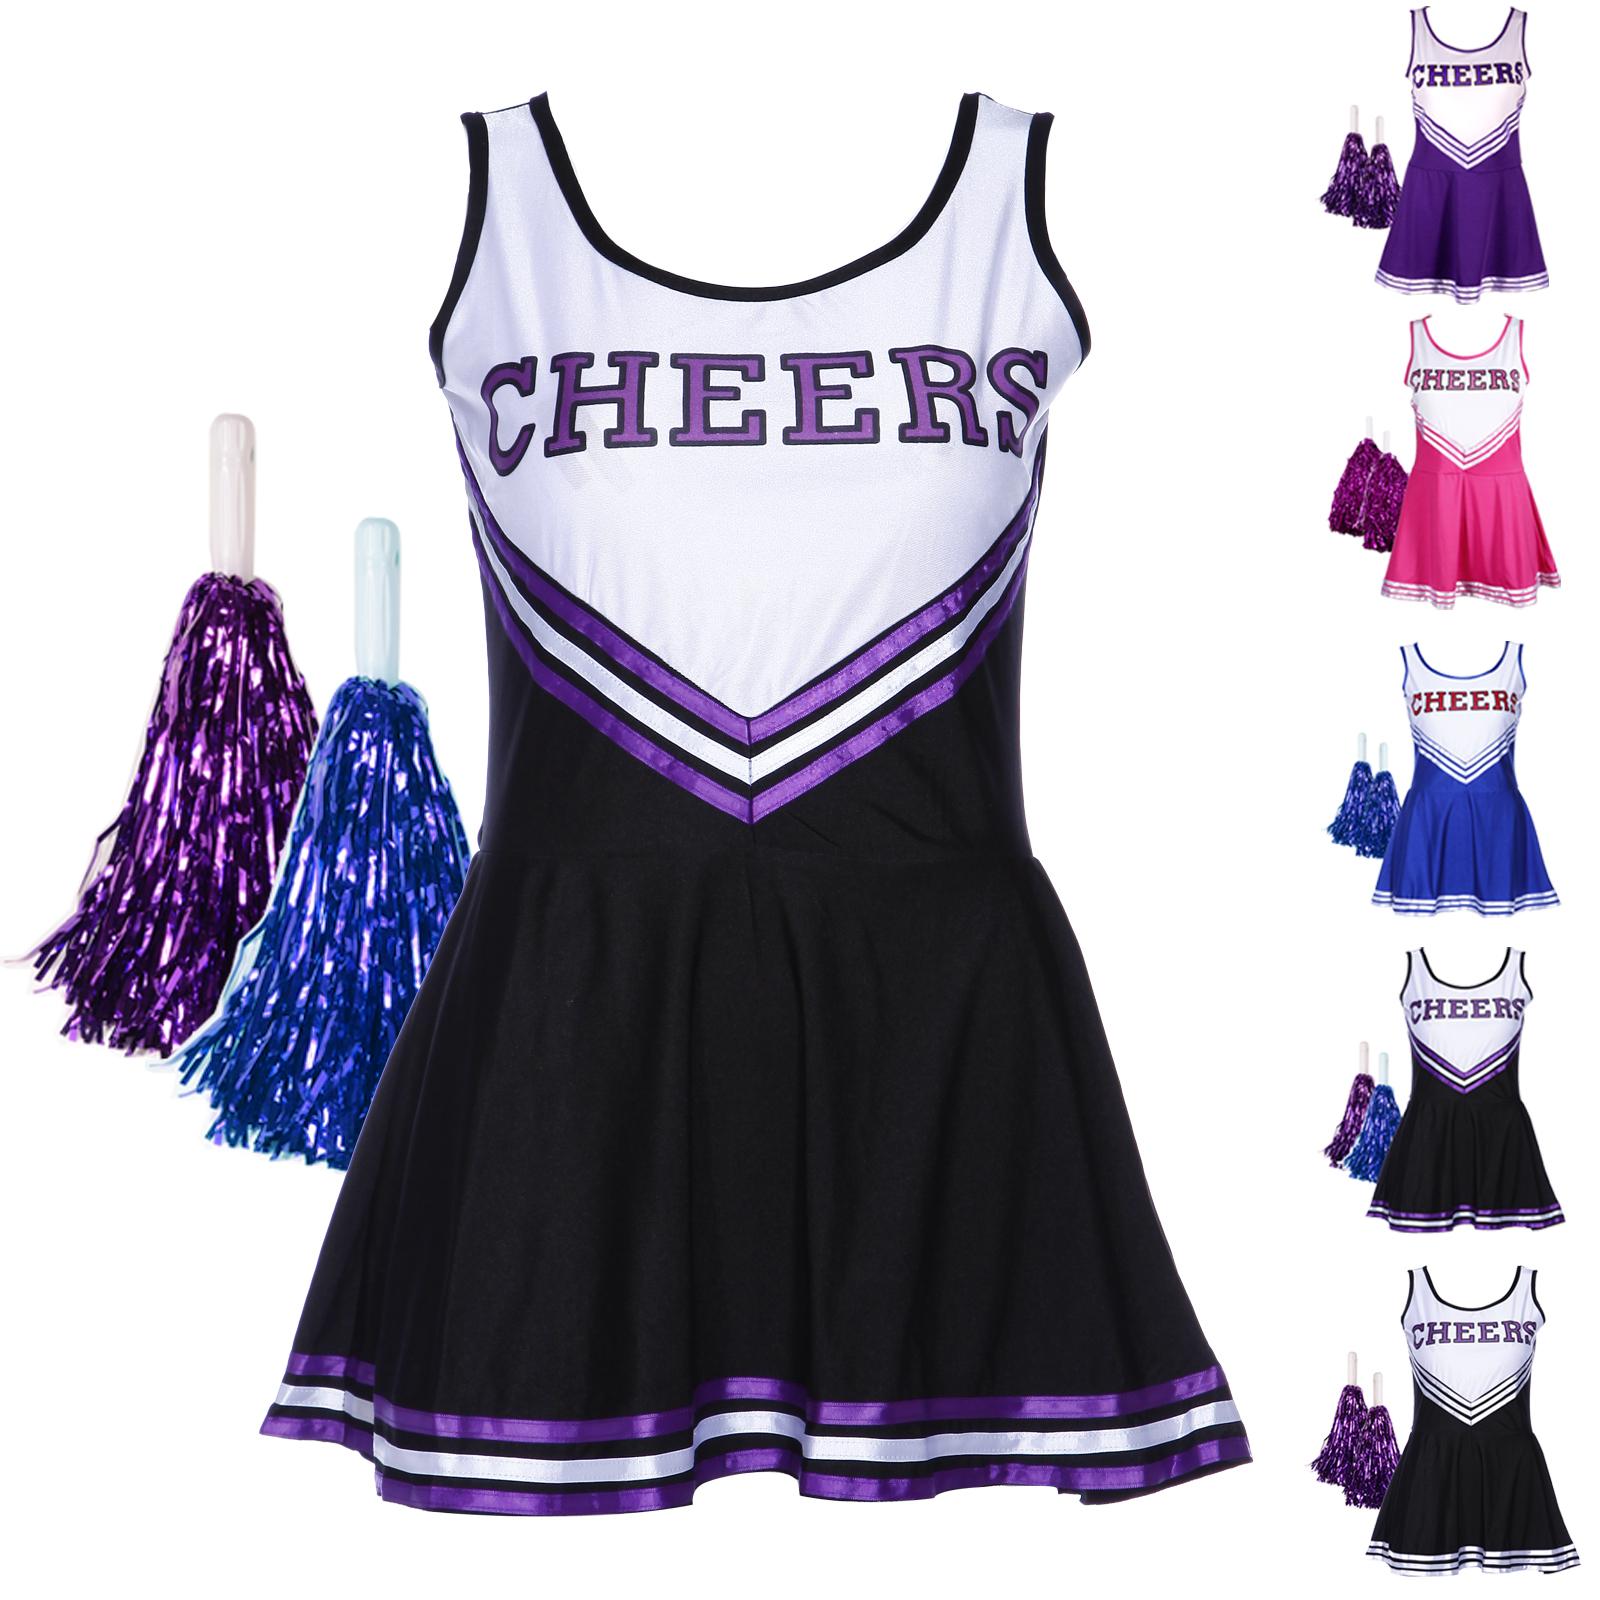 cheerleading costumes clothes costume